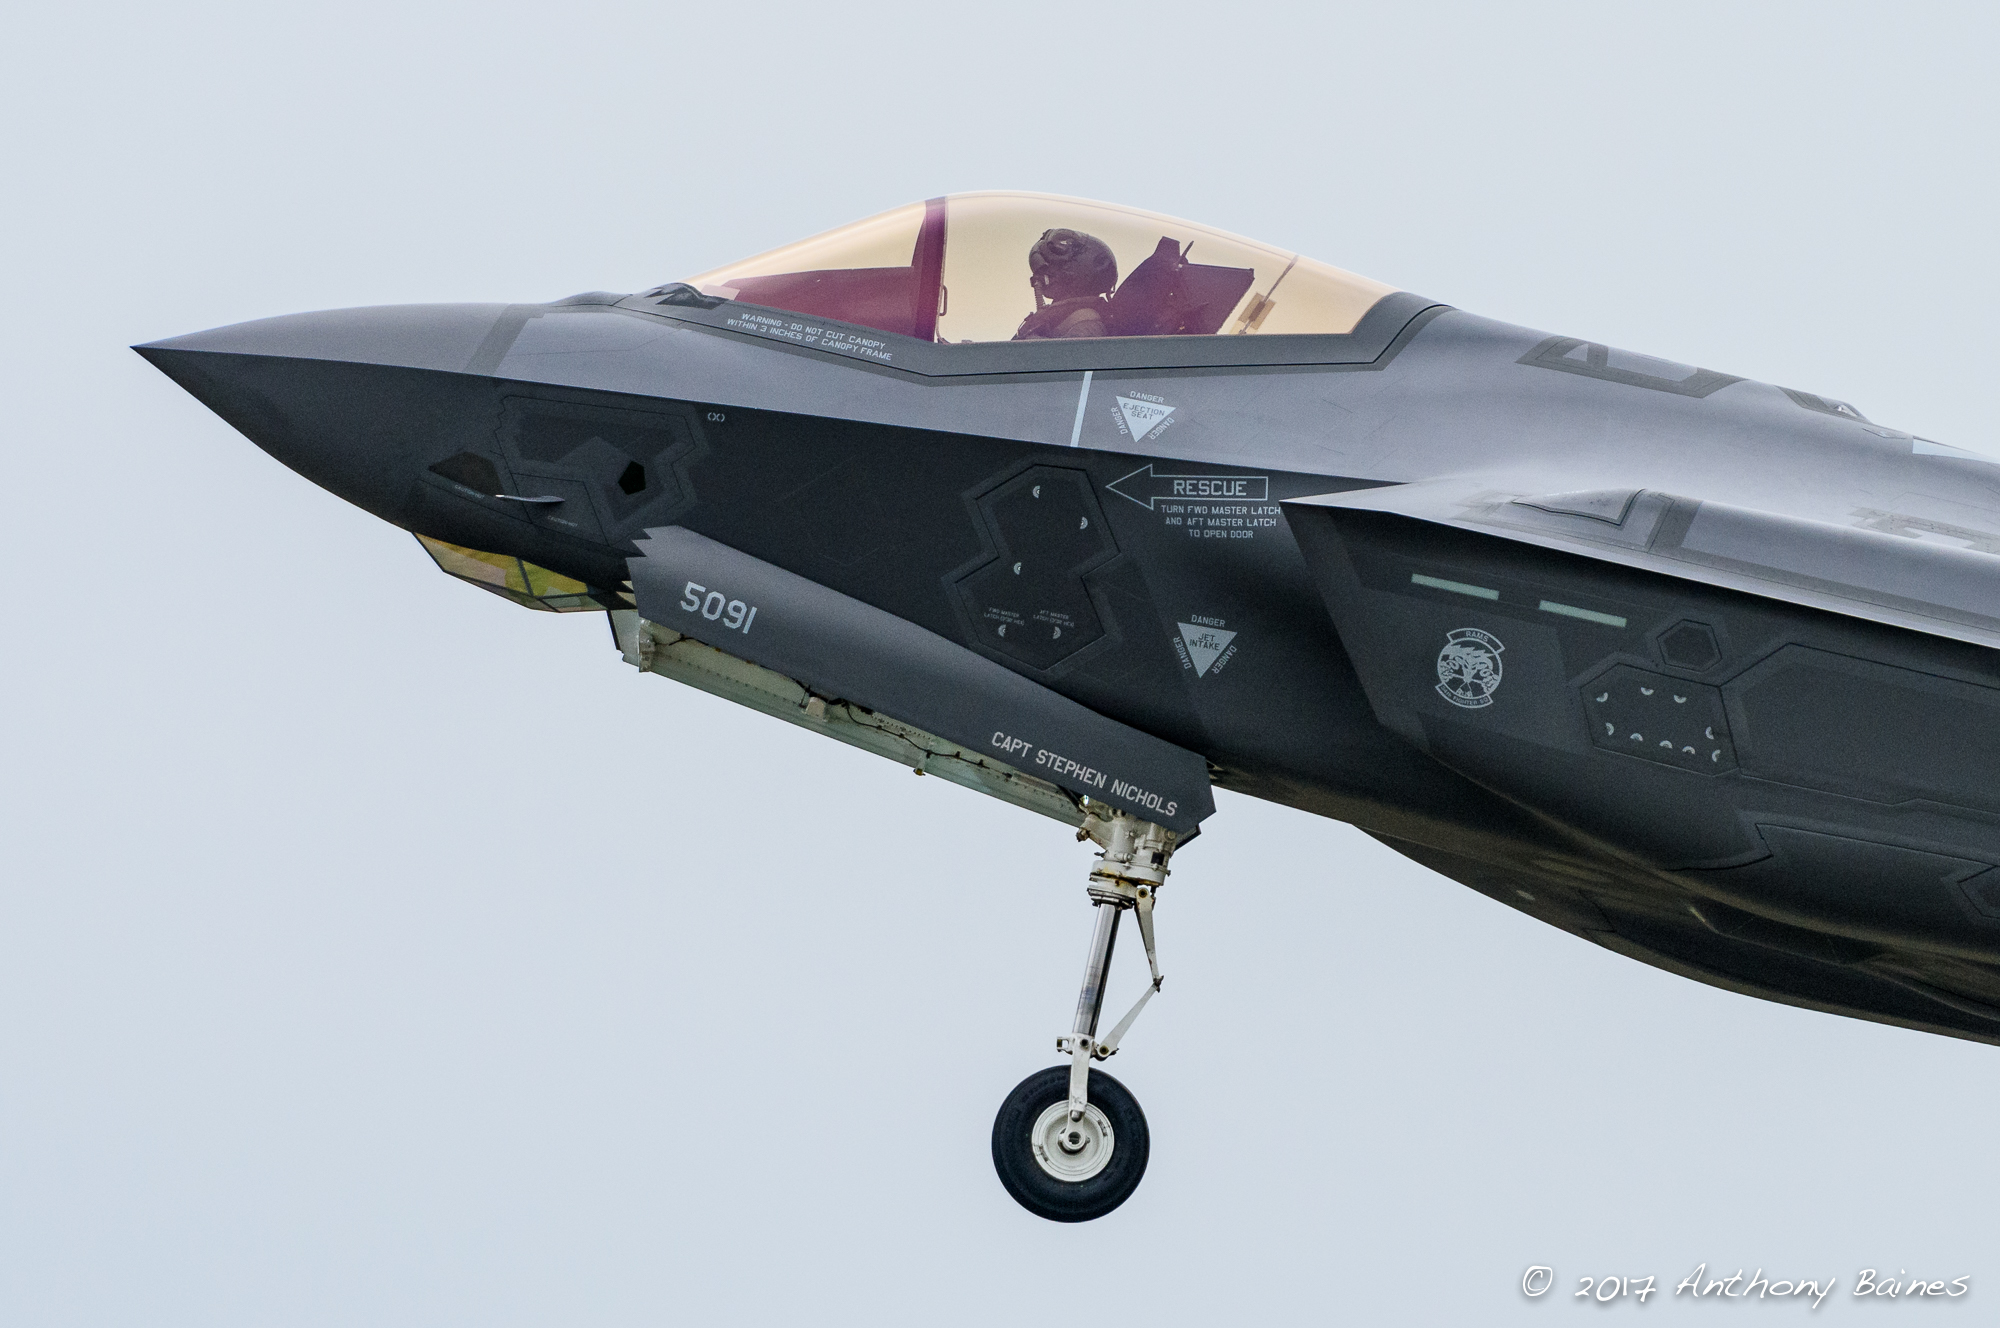 F-35A, cockpit region